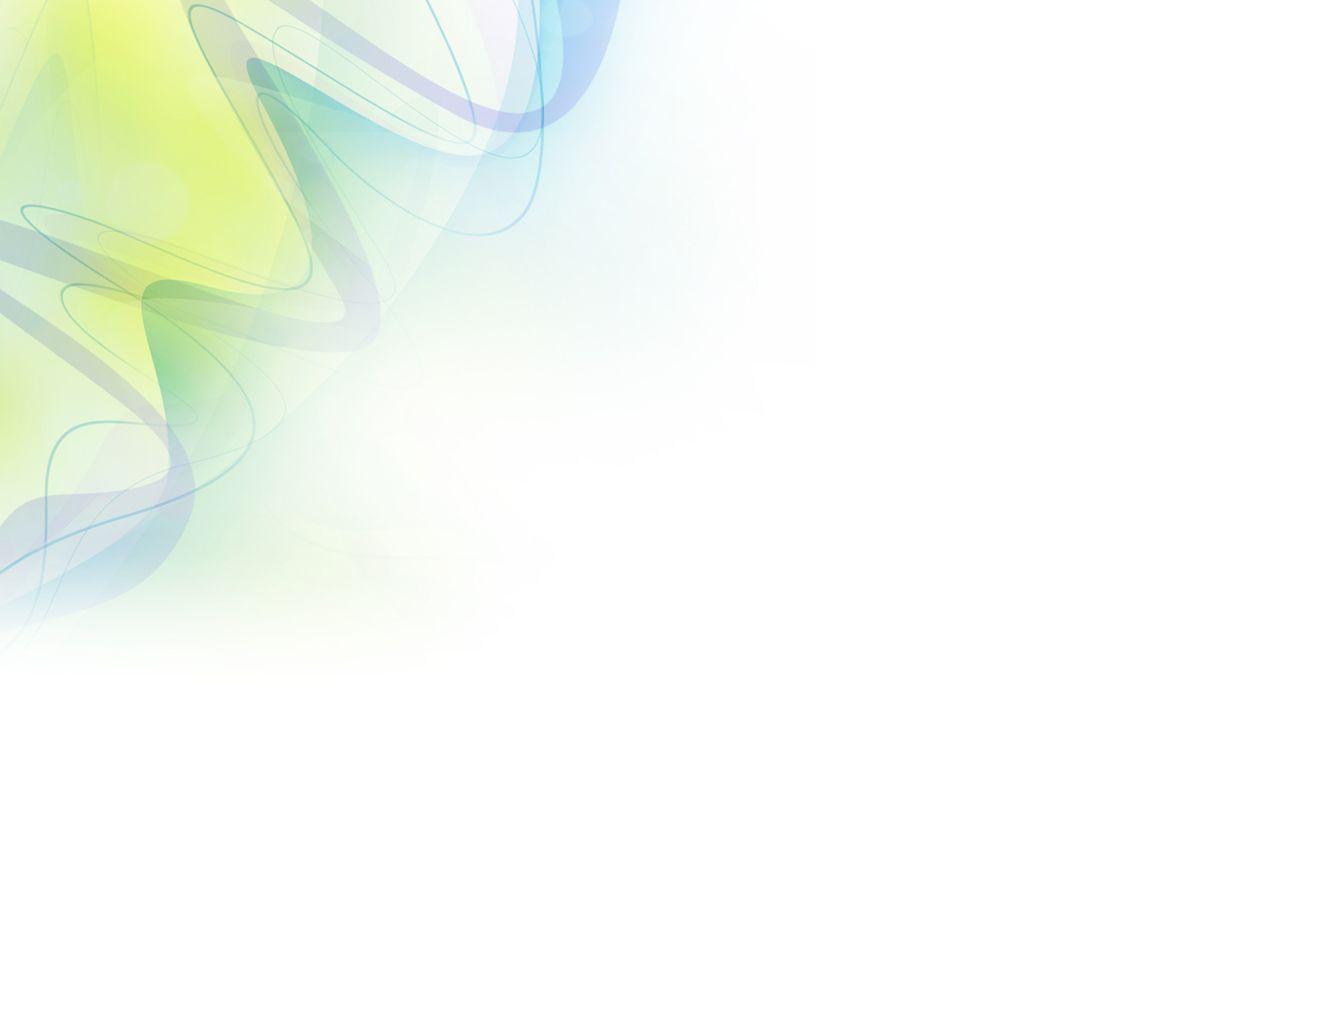 Ppt backgrounds | Best Website For Homework Help Services | 1024x1335